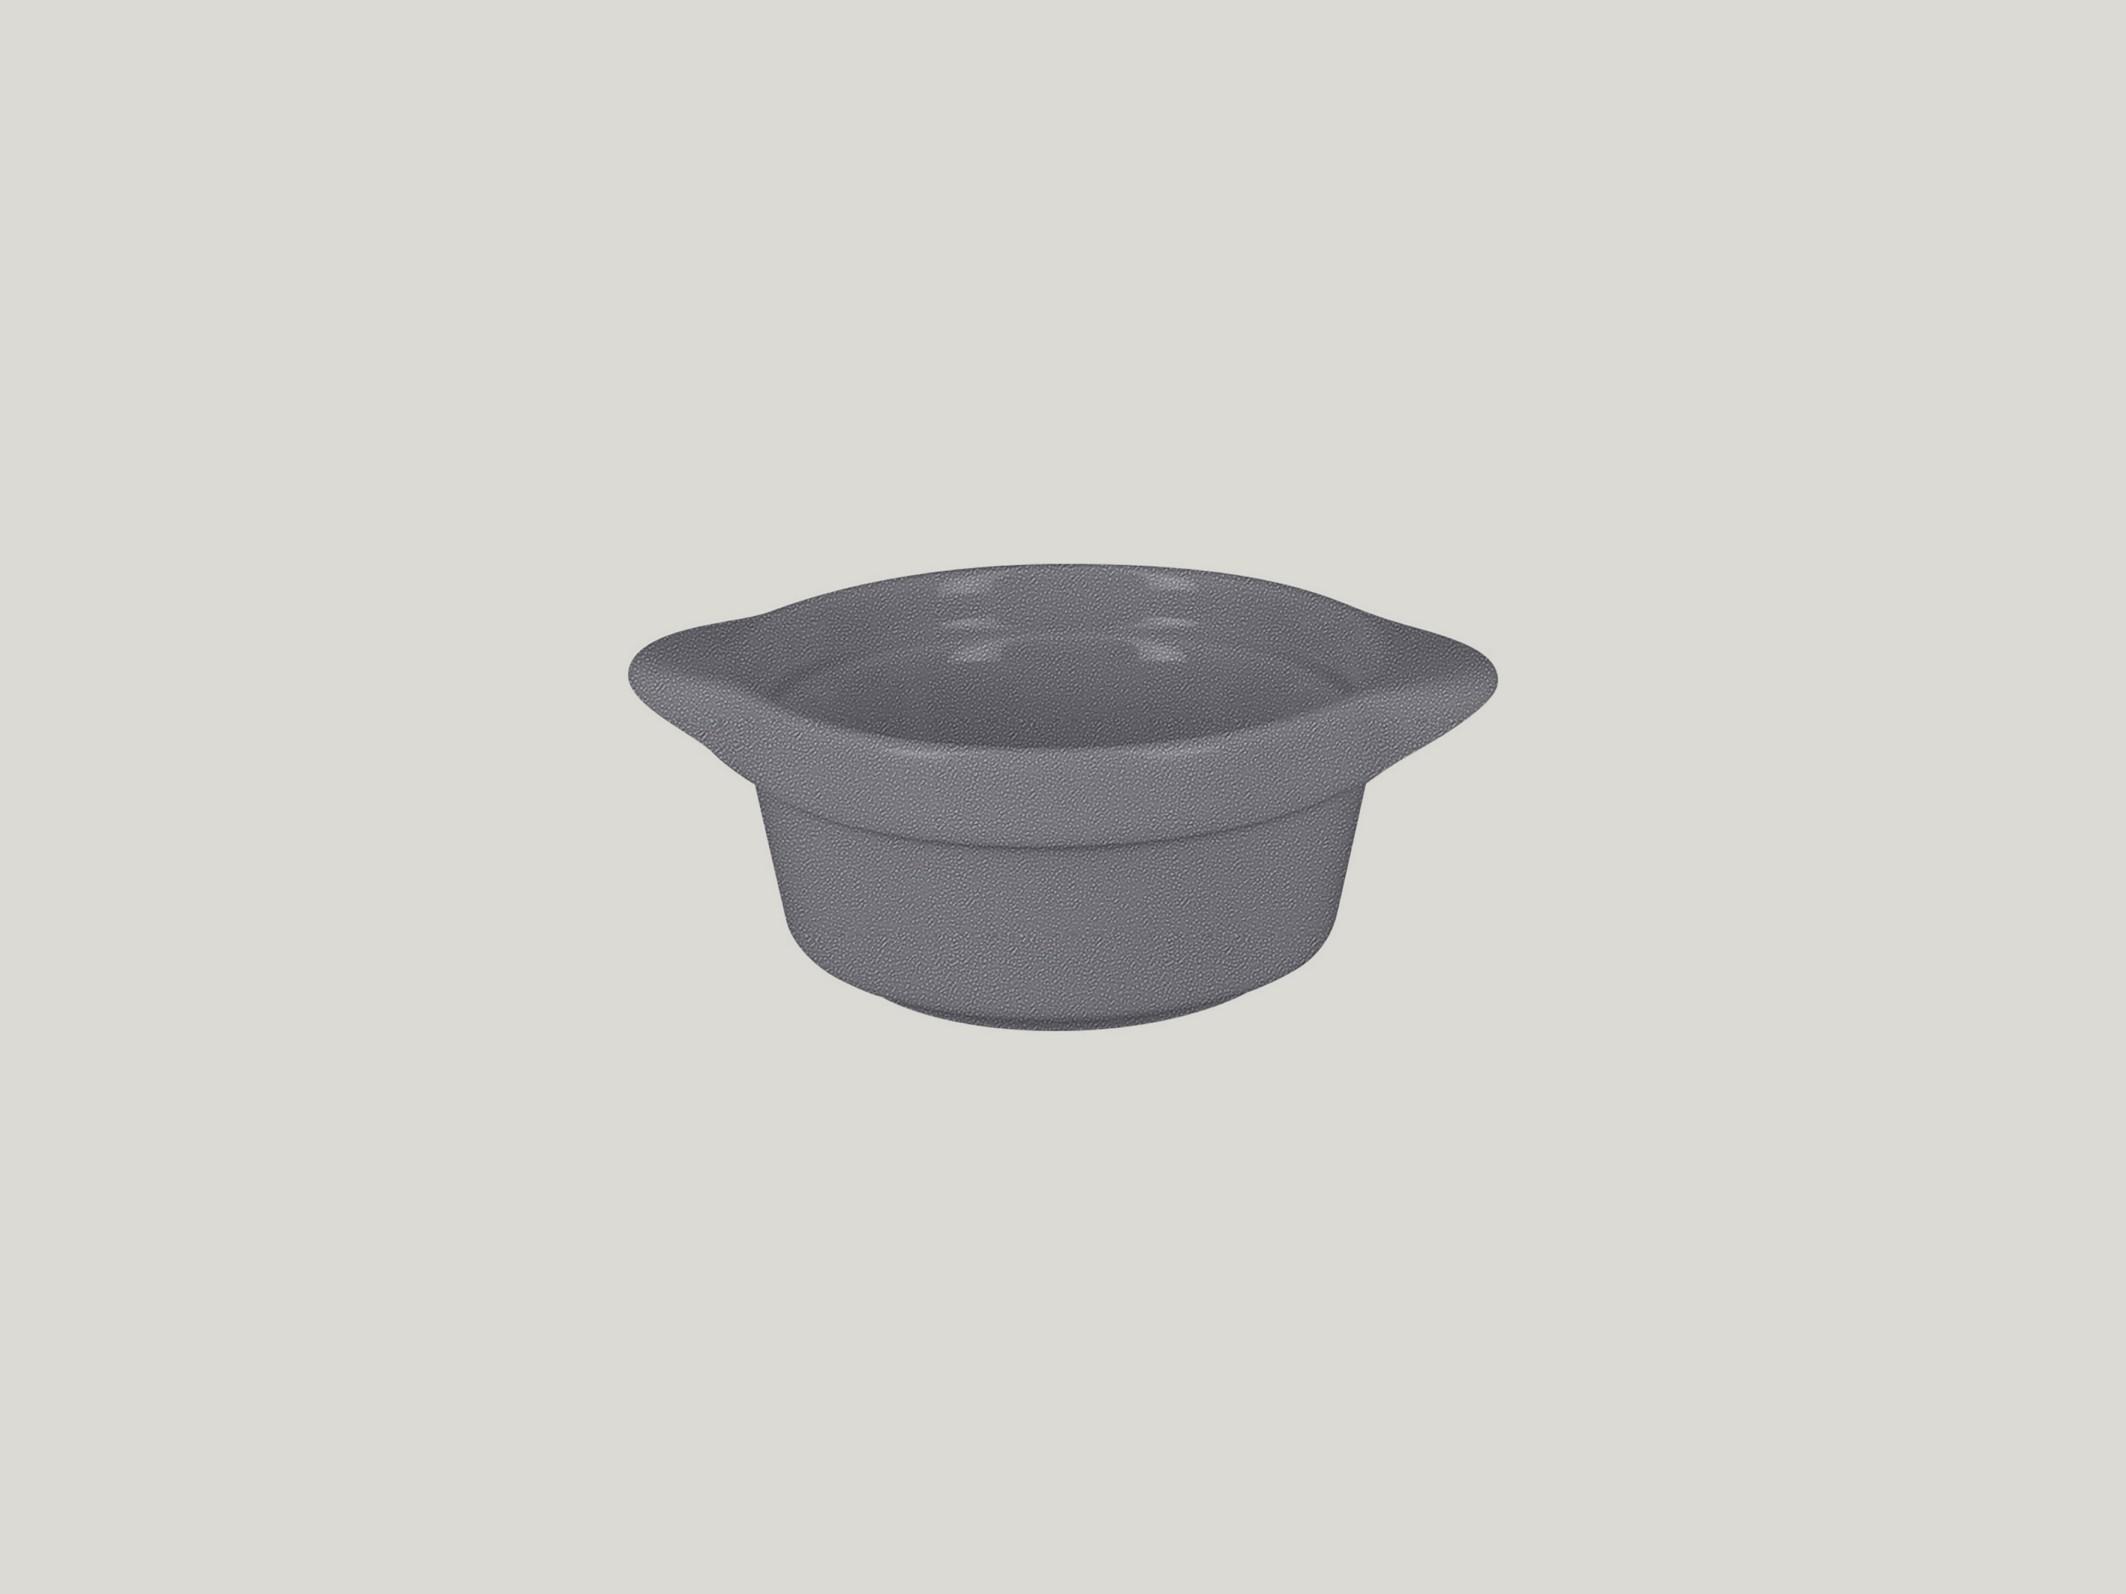 Chefs fusion Mini hrnec šedý